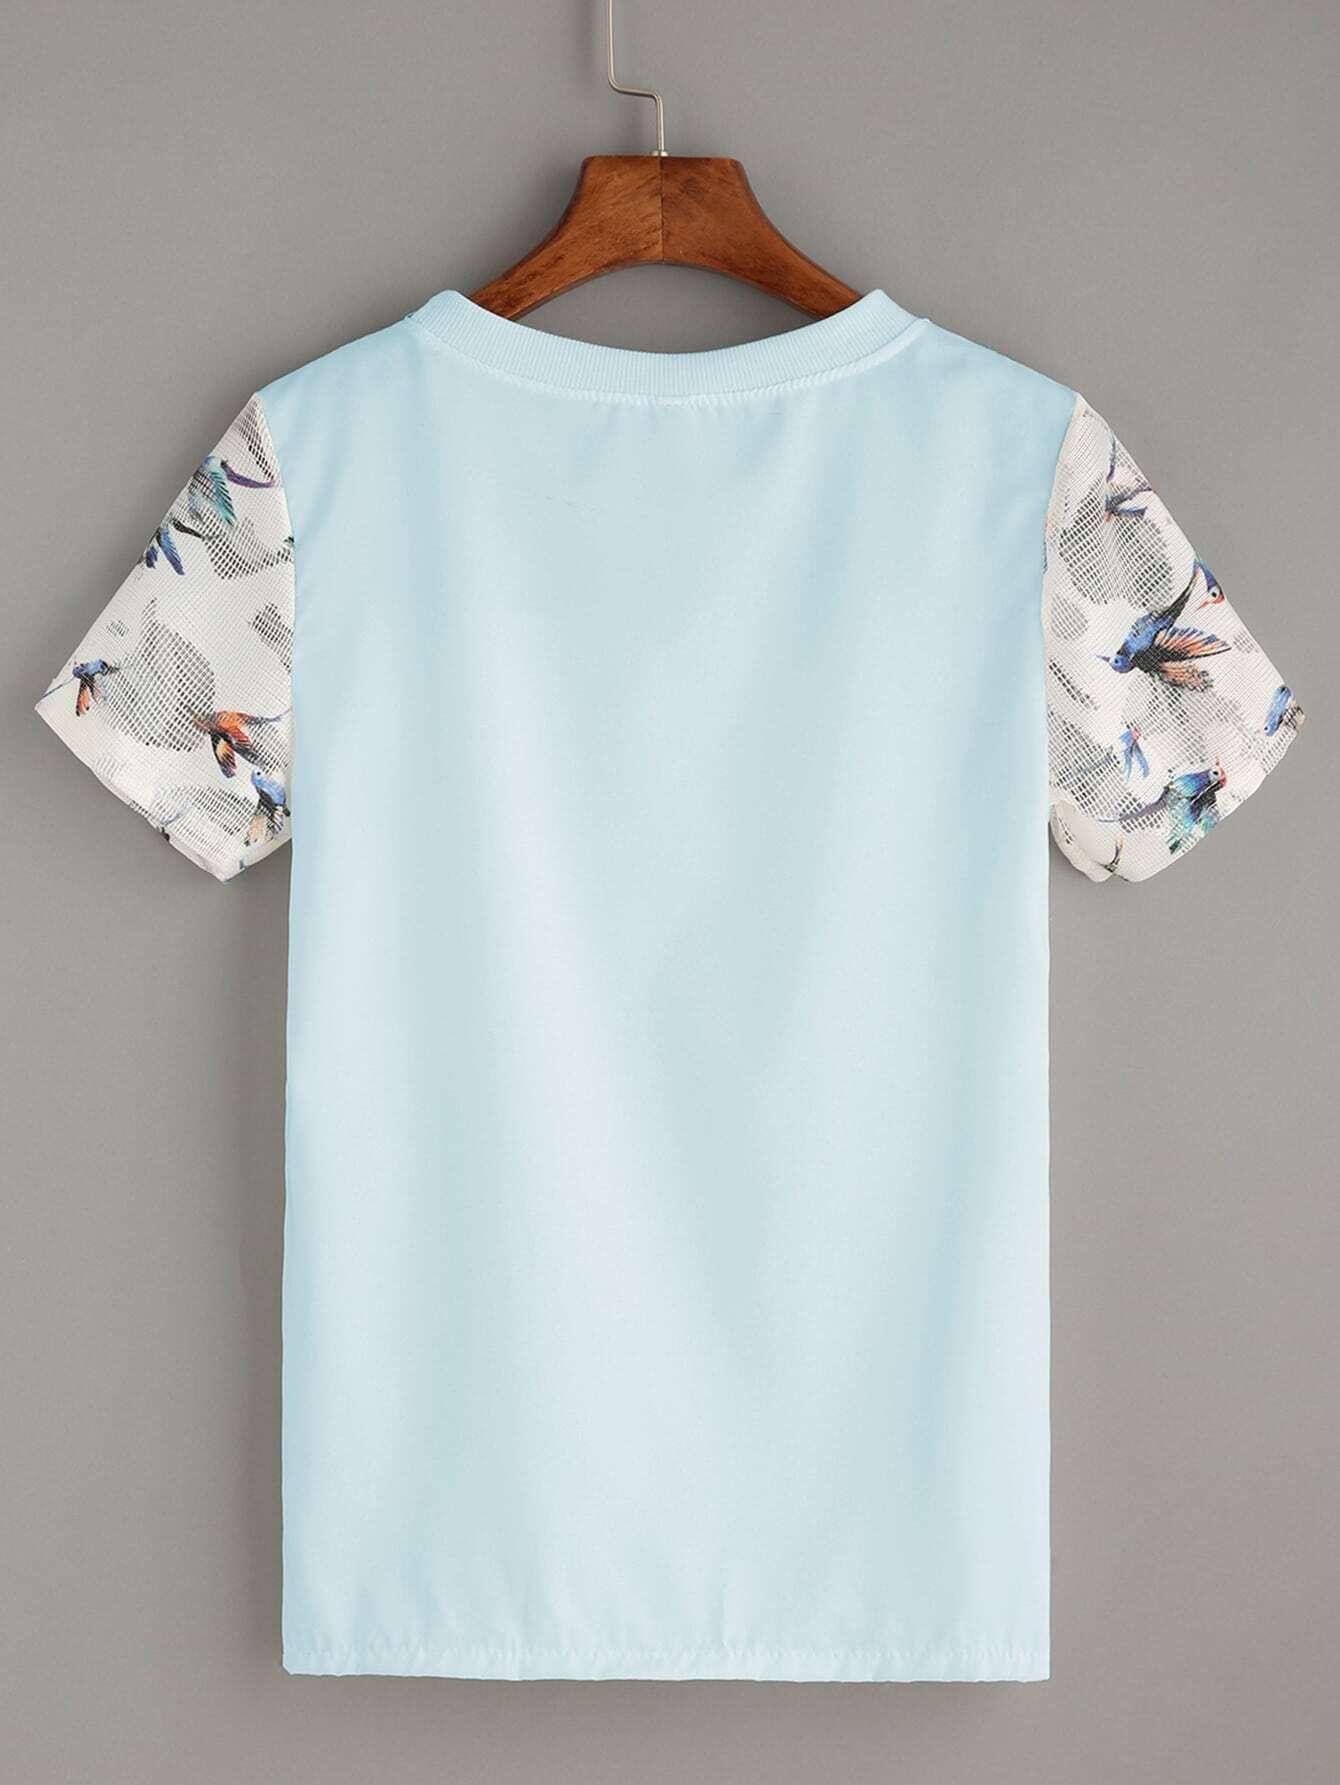 blouse170410110_2